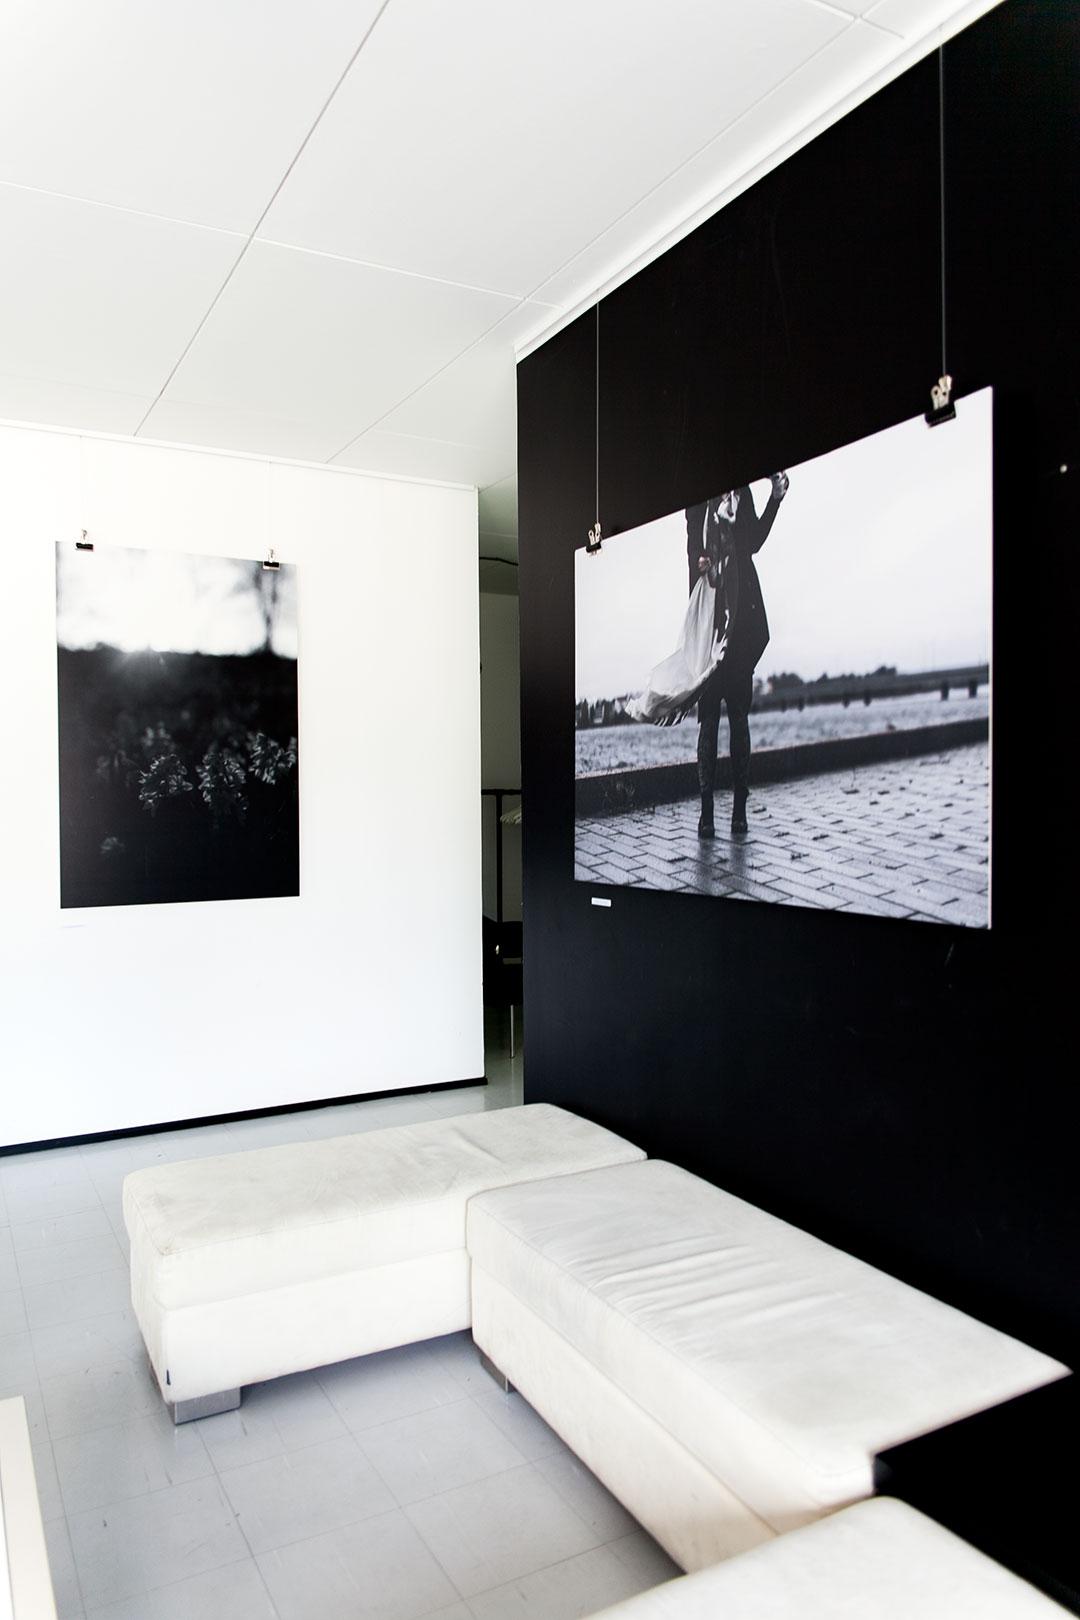 imissyoueveryotherday_exhibition_02